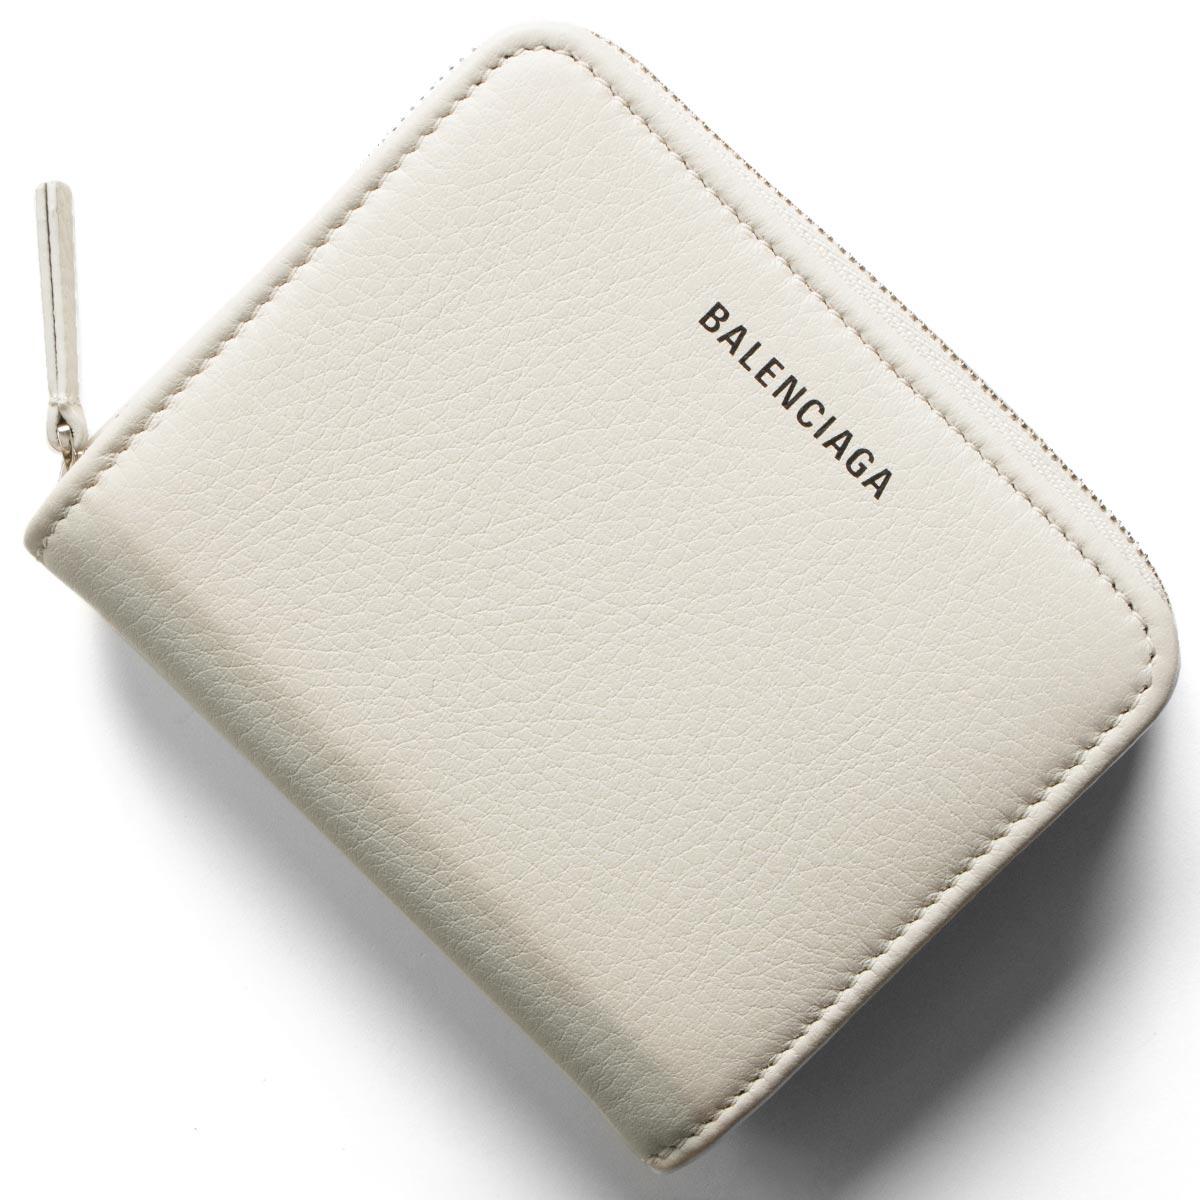 e16225272bb6 551933 フルラ DLQ0N 1209 BALENCIAGA バレンシアガ 二つ折り財布 財布 レディース エブリディ ビルフォールド  ホワイト&ブラック セリーヌ お買い得